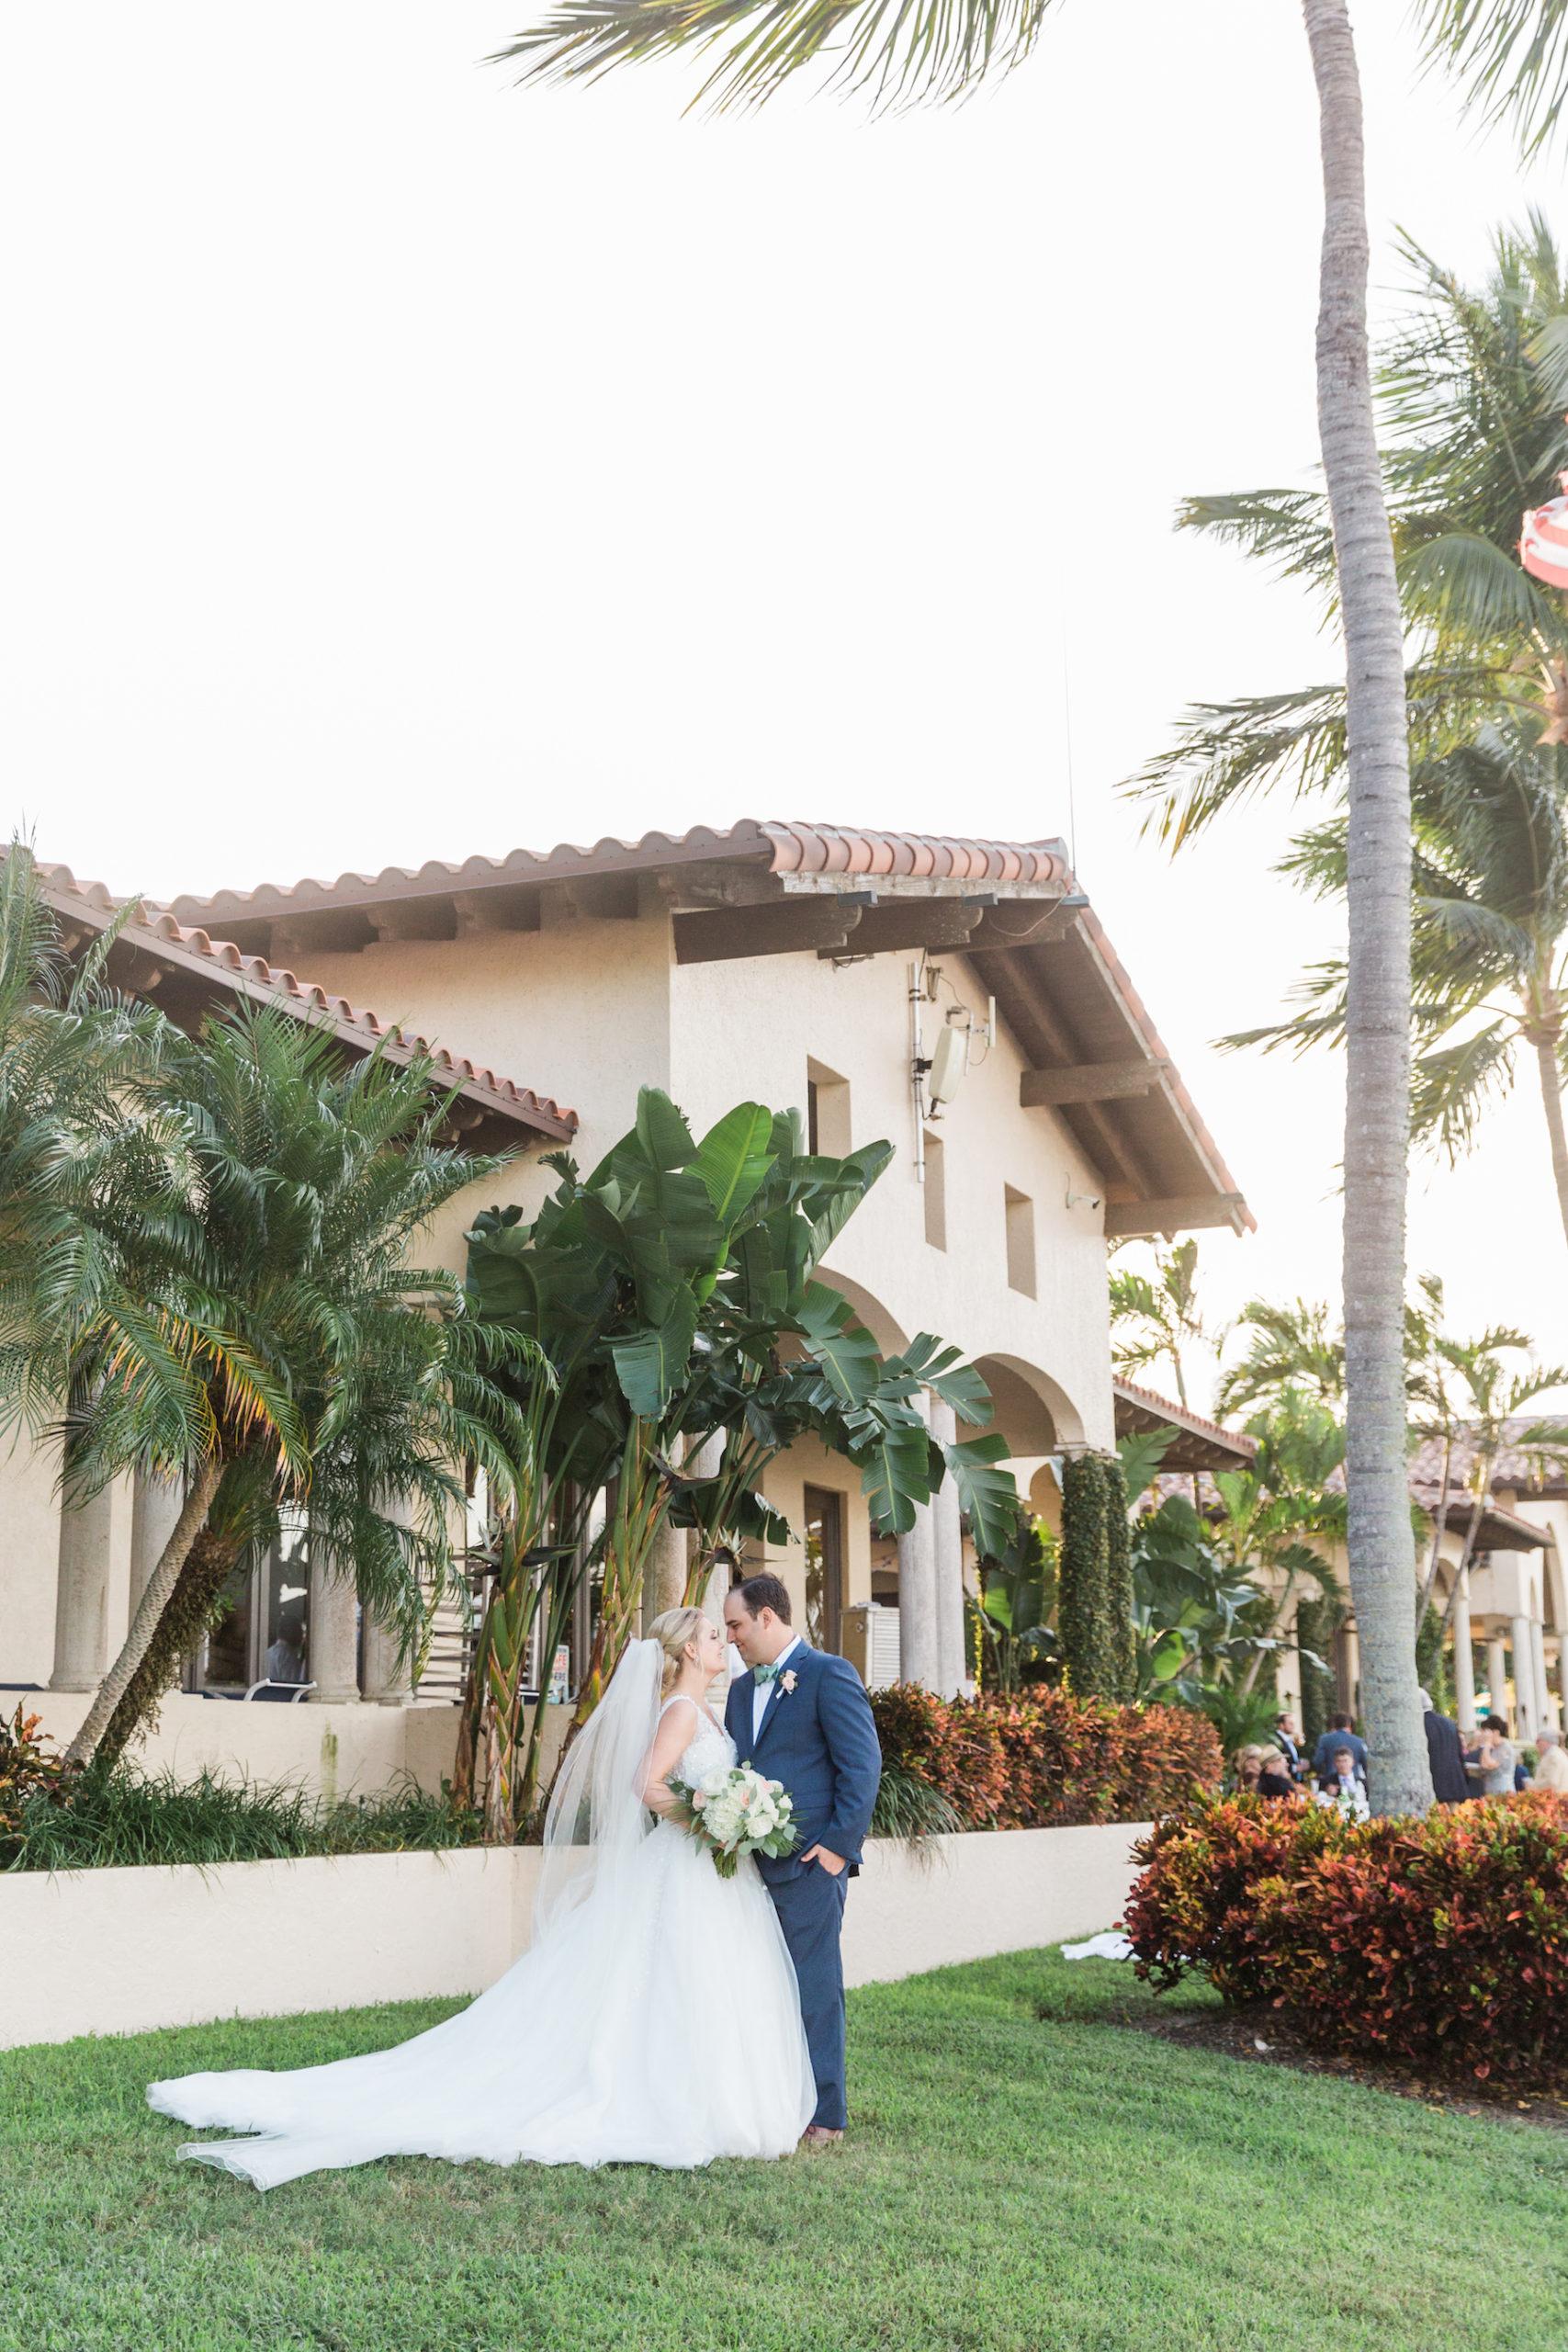 Destination Florida Bride and Groom Lawn Wedding Portrait | Sarasota Wedding Venue The Resort at Longboat Key Club